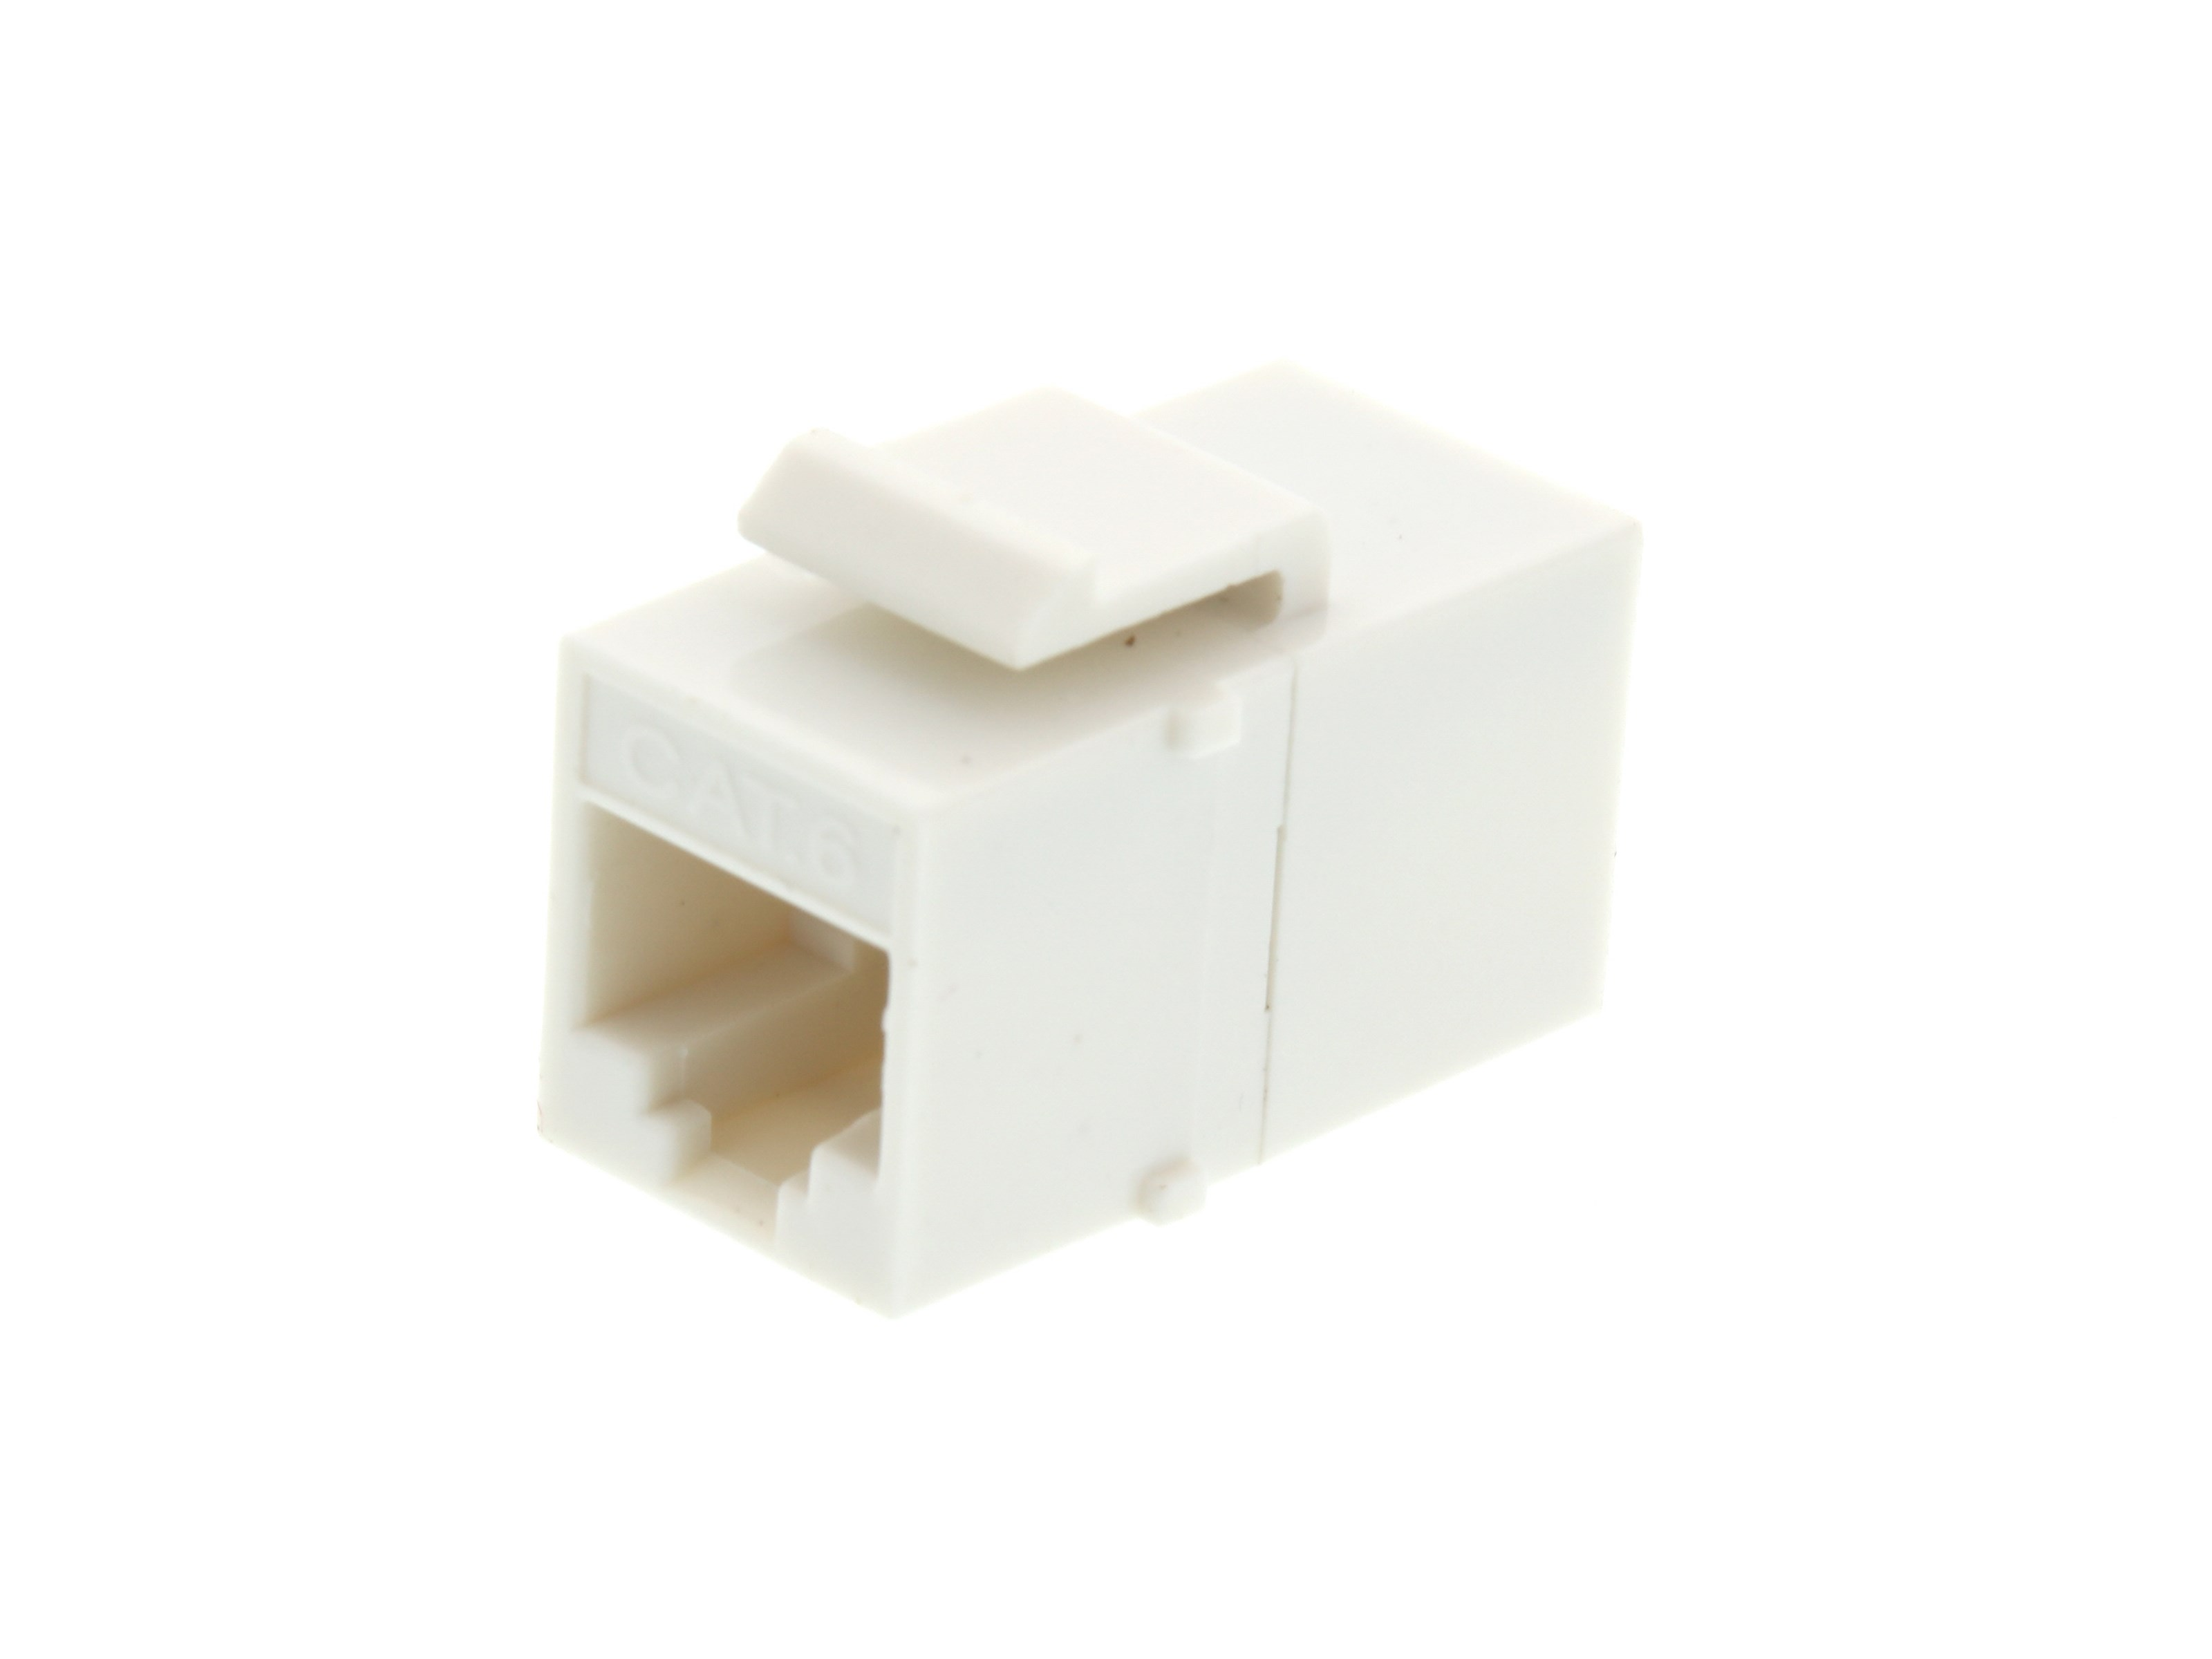 Rj45 Cat6 Keystone Jack Pass Through Panel Mount White Connector Cat 6 Modular Plug Picture Of